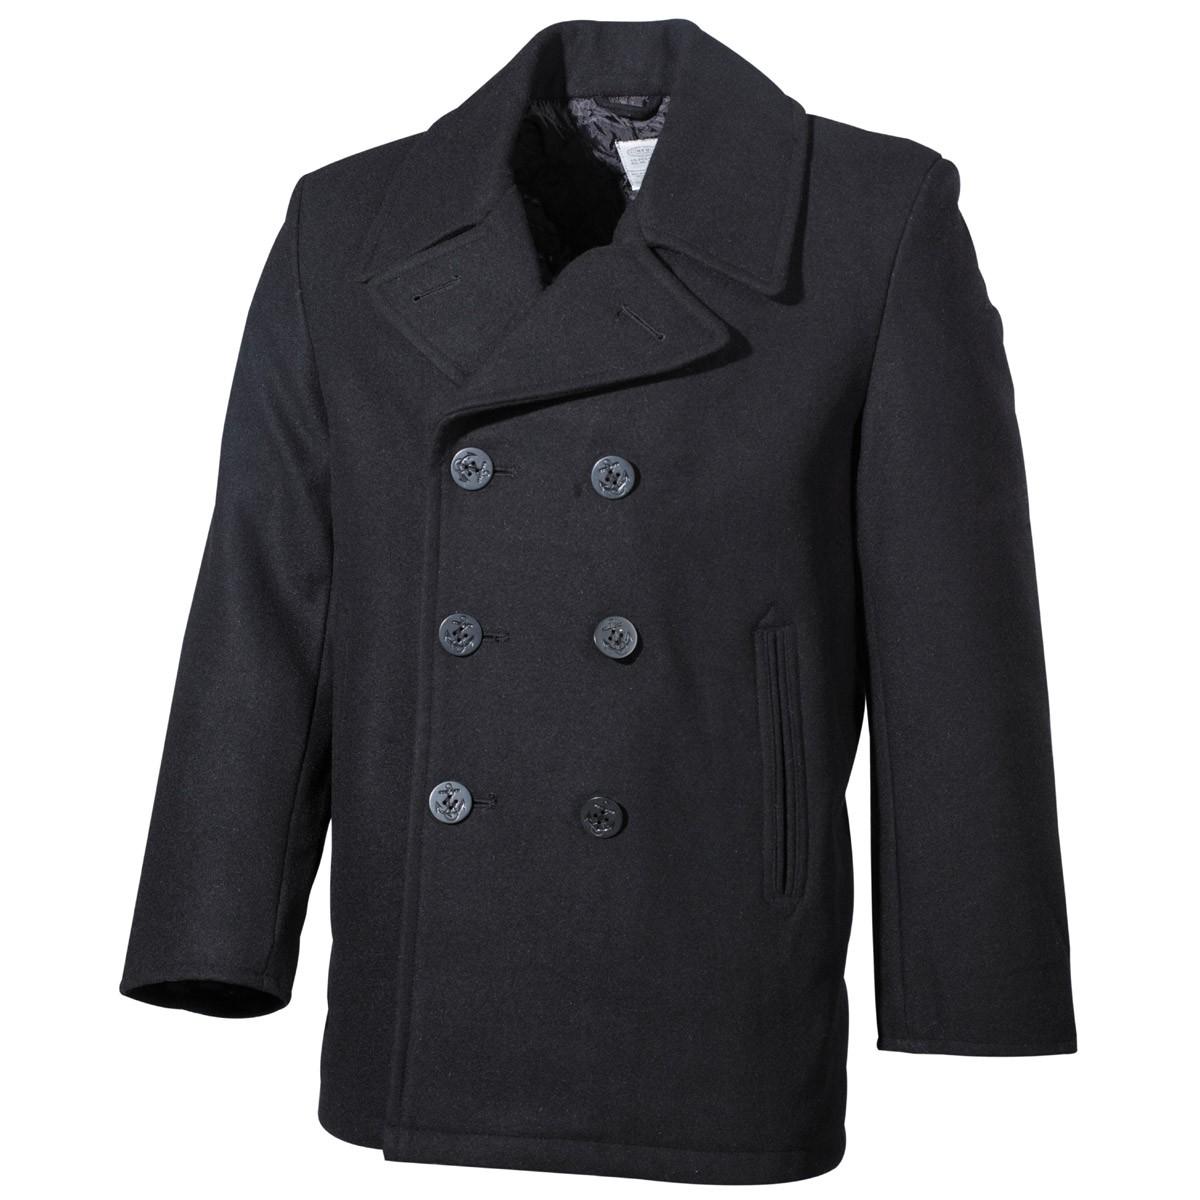 US Pea Coat MFH - černý